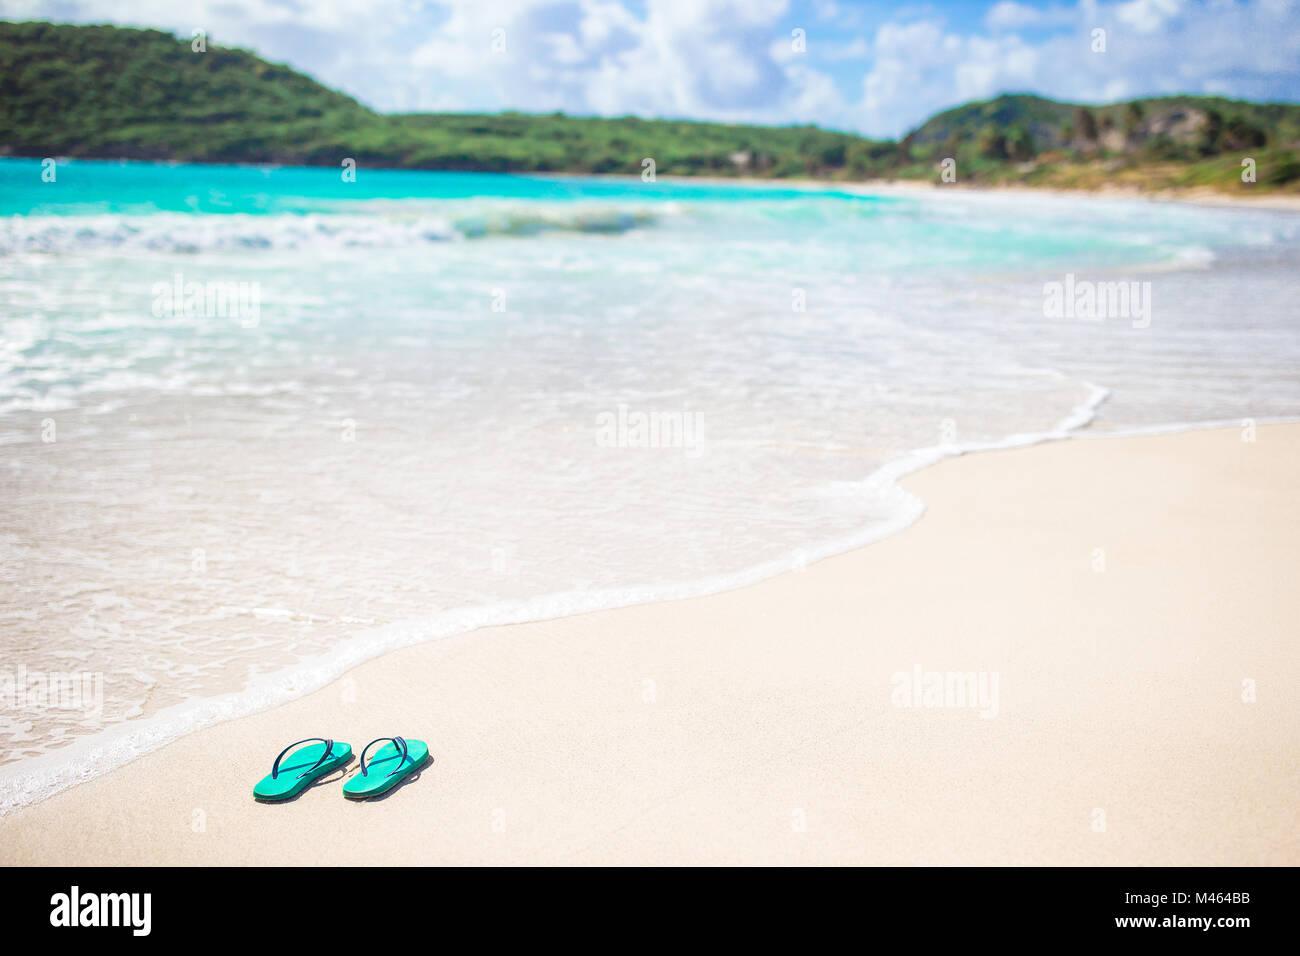 b756b7c2c Summer mint flipflops with sunglasses on white beach Stock Photo ...